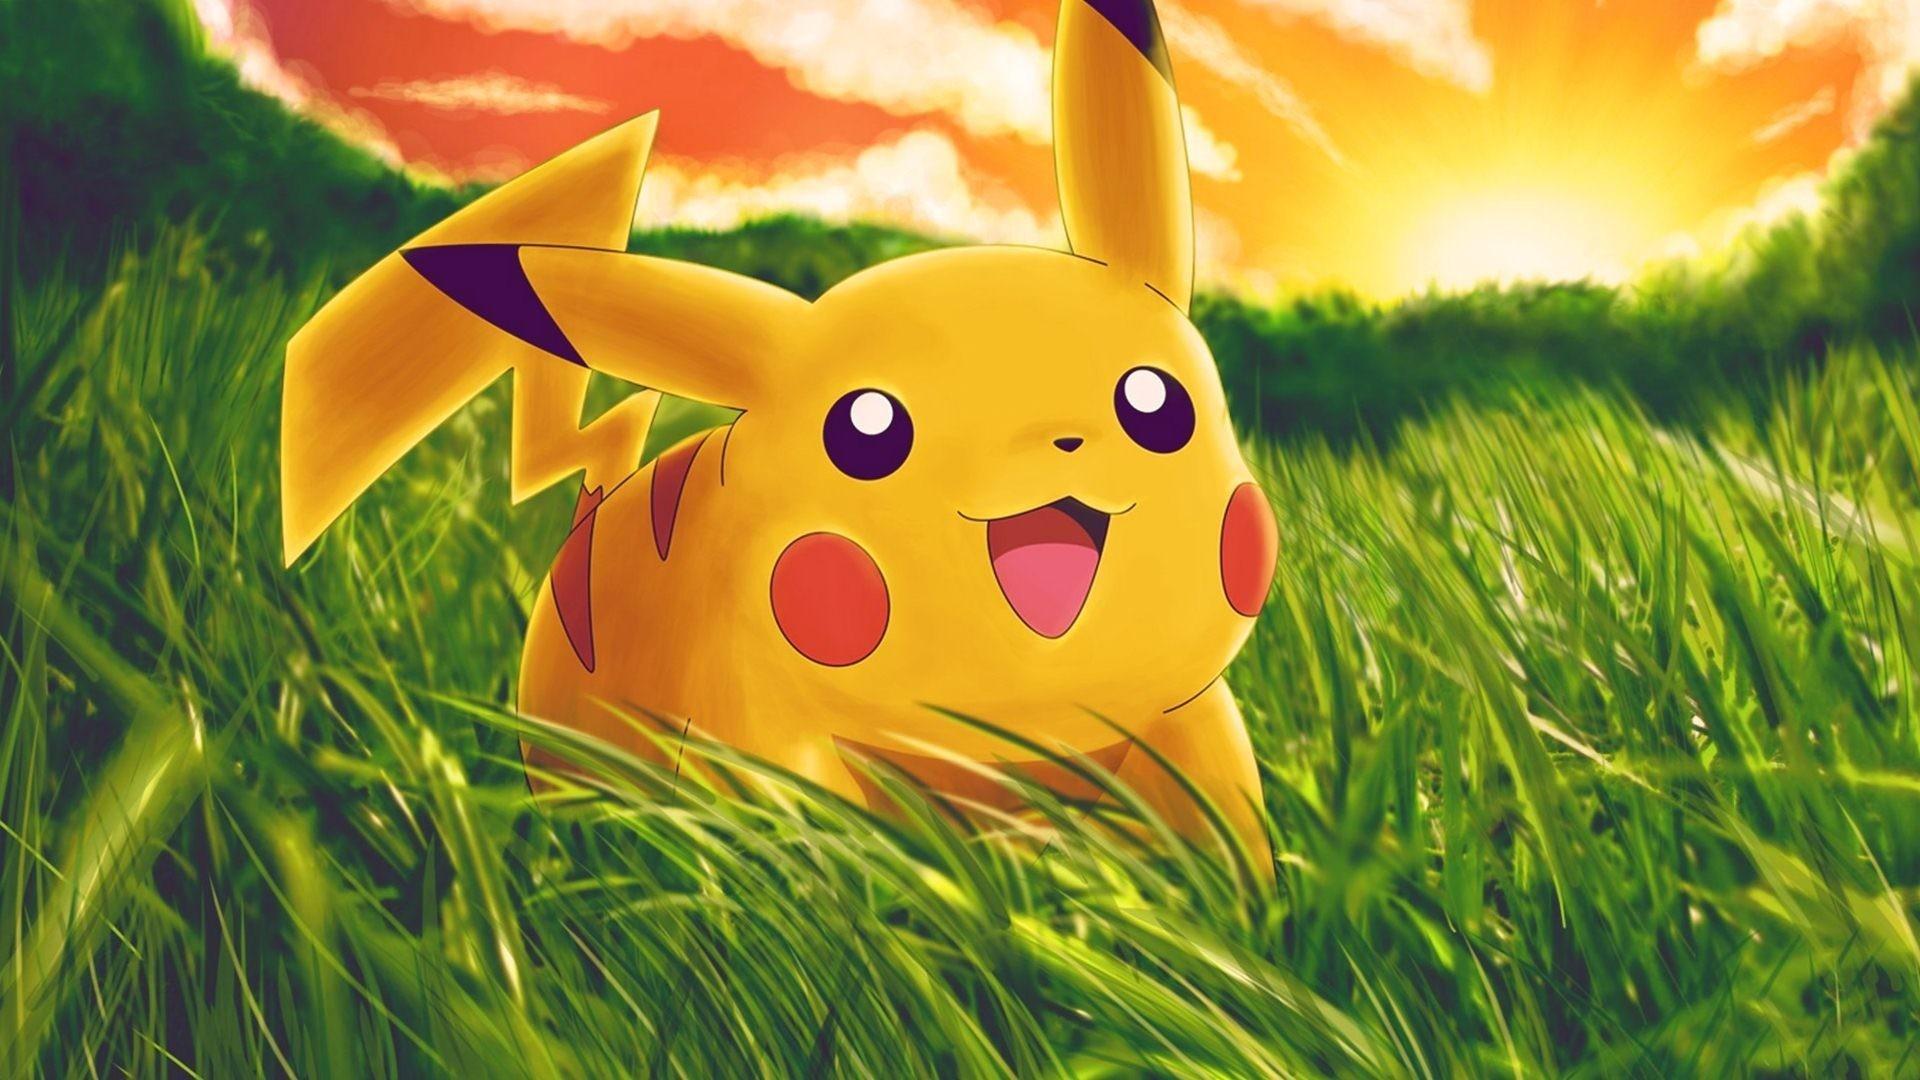 Pikachu pokemon cartoon wallpaper